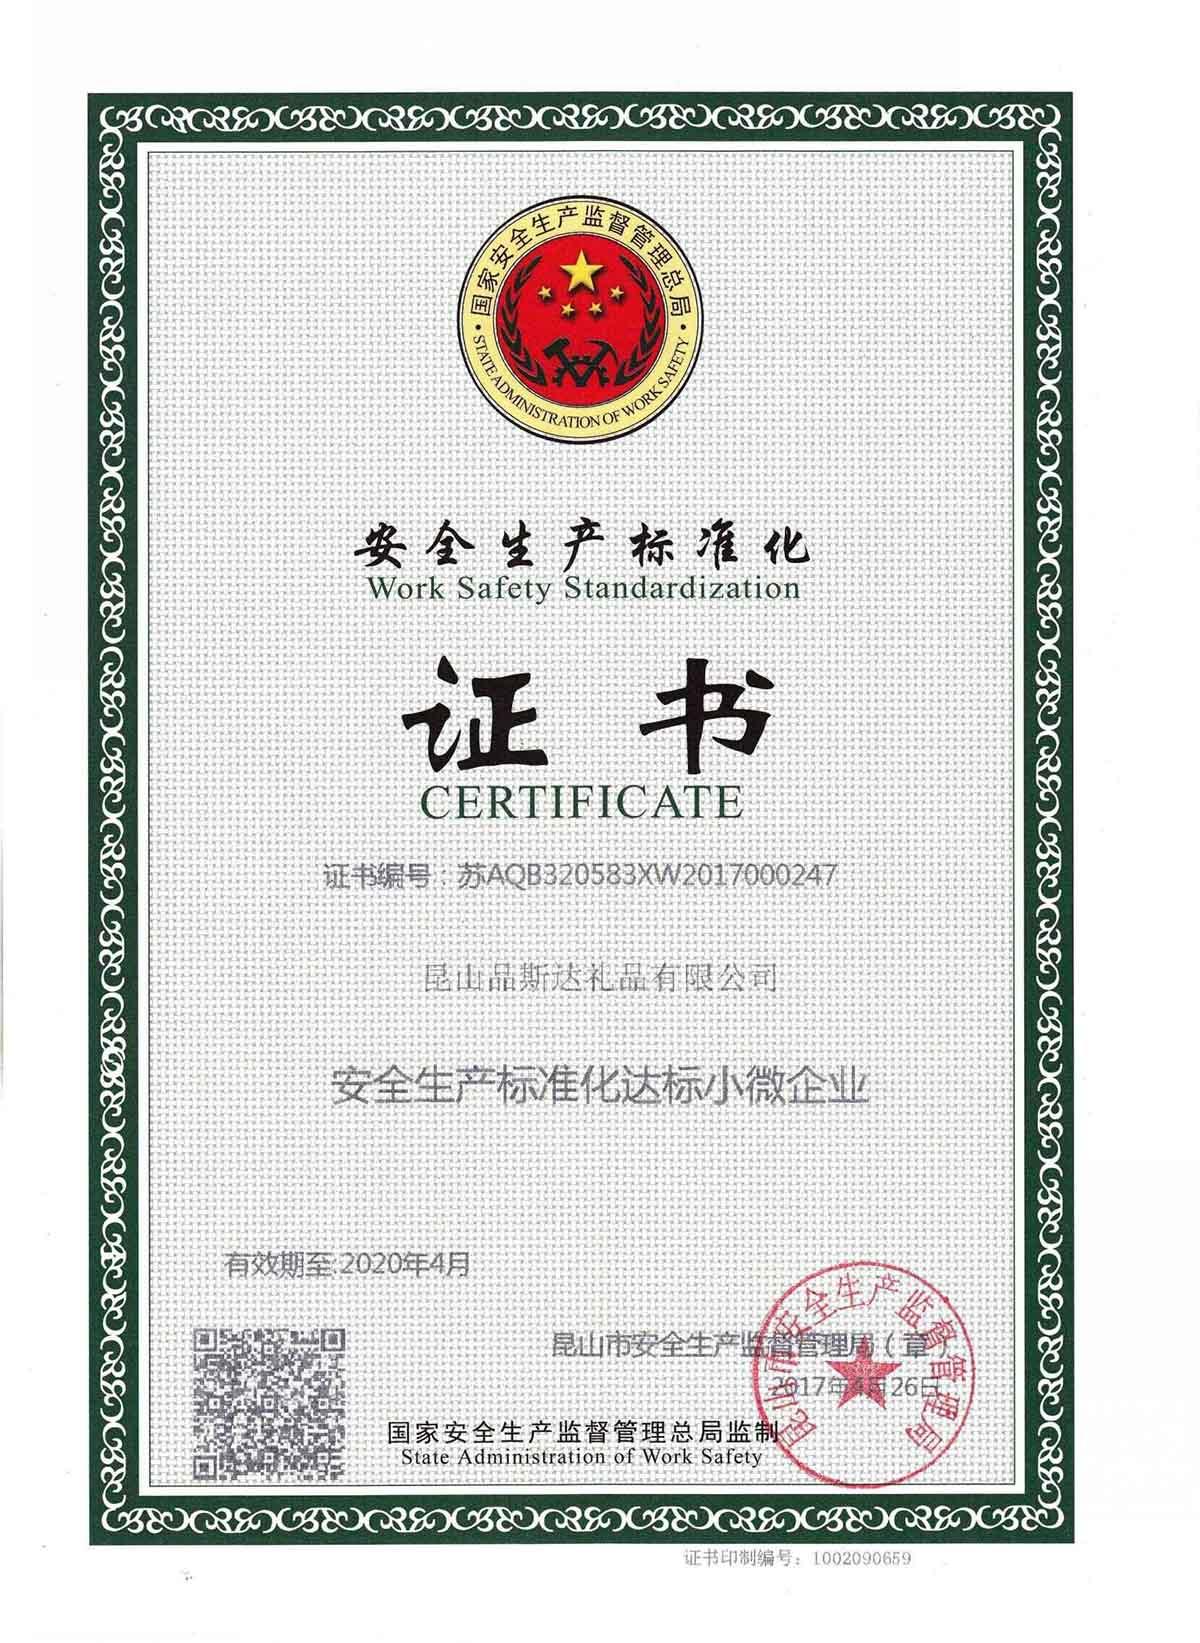 Work Safety Standardization Certificate